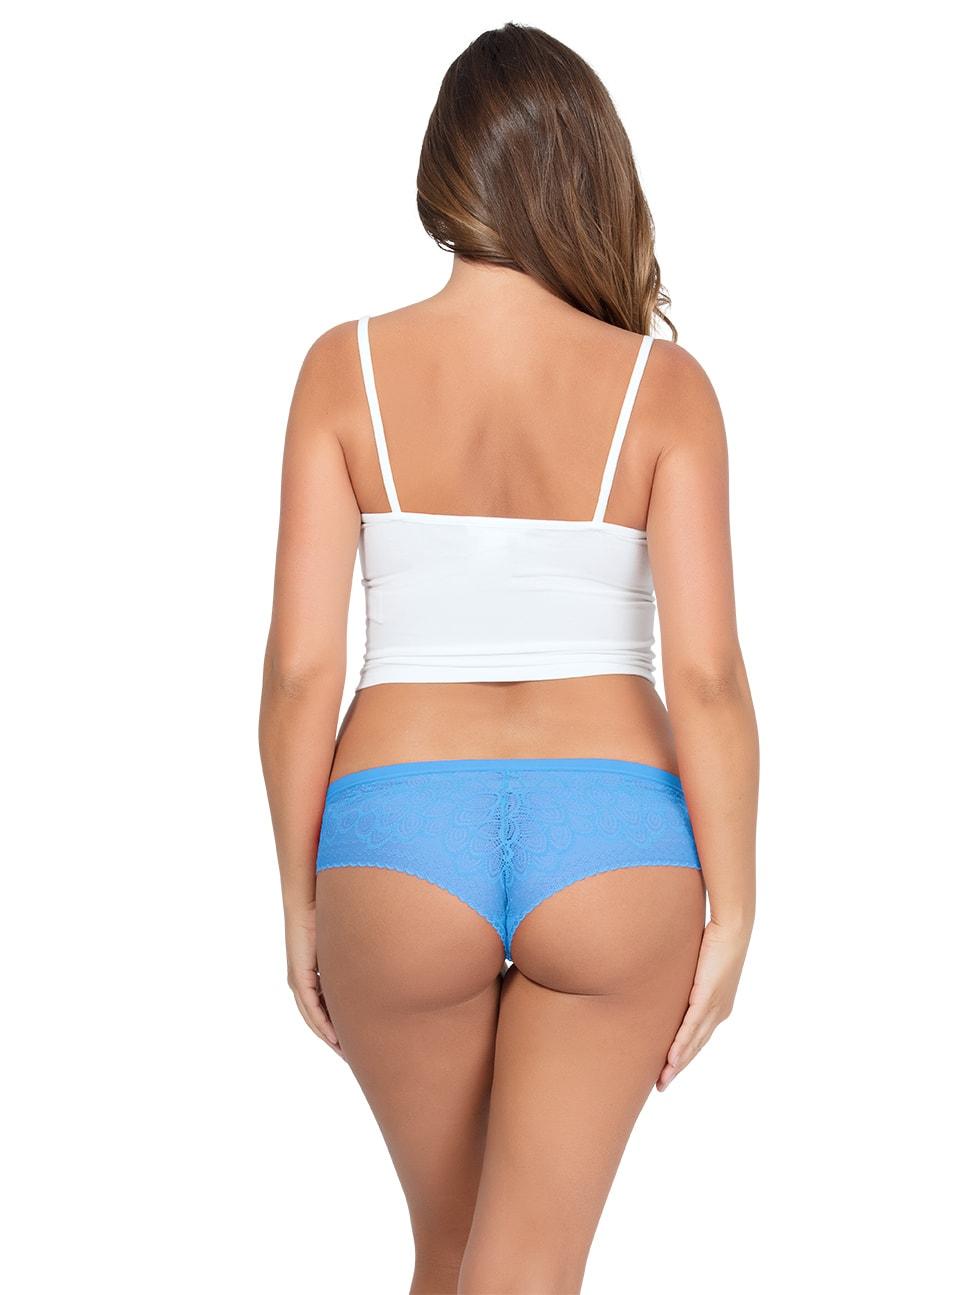 ParfaitPanty SoGlam HIPSTERPP502 MediterraneanBlue BACK copy 1 - Parfait Panty So Glam Hipster - Mediterranean Blue - PP502